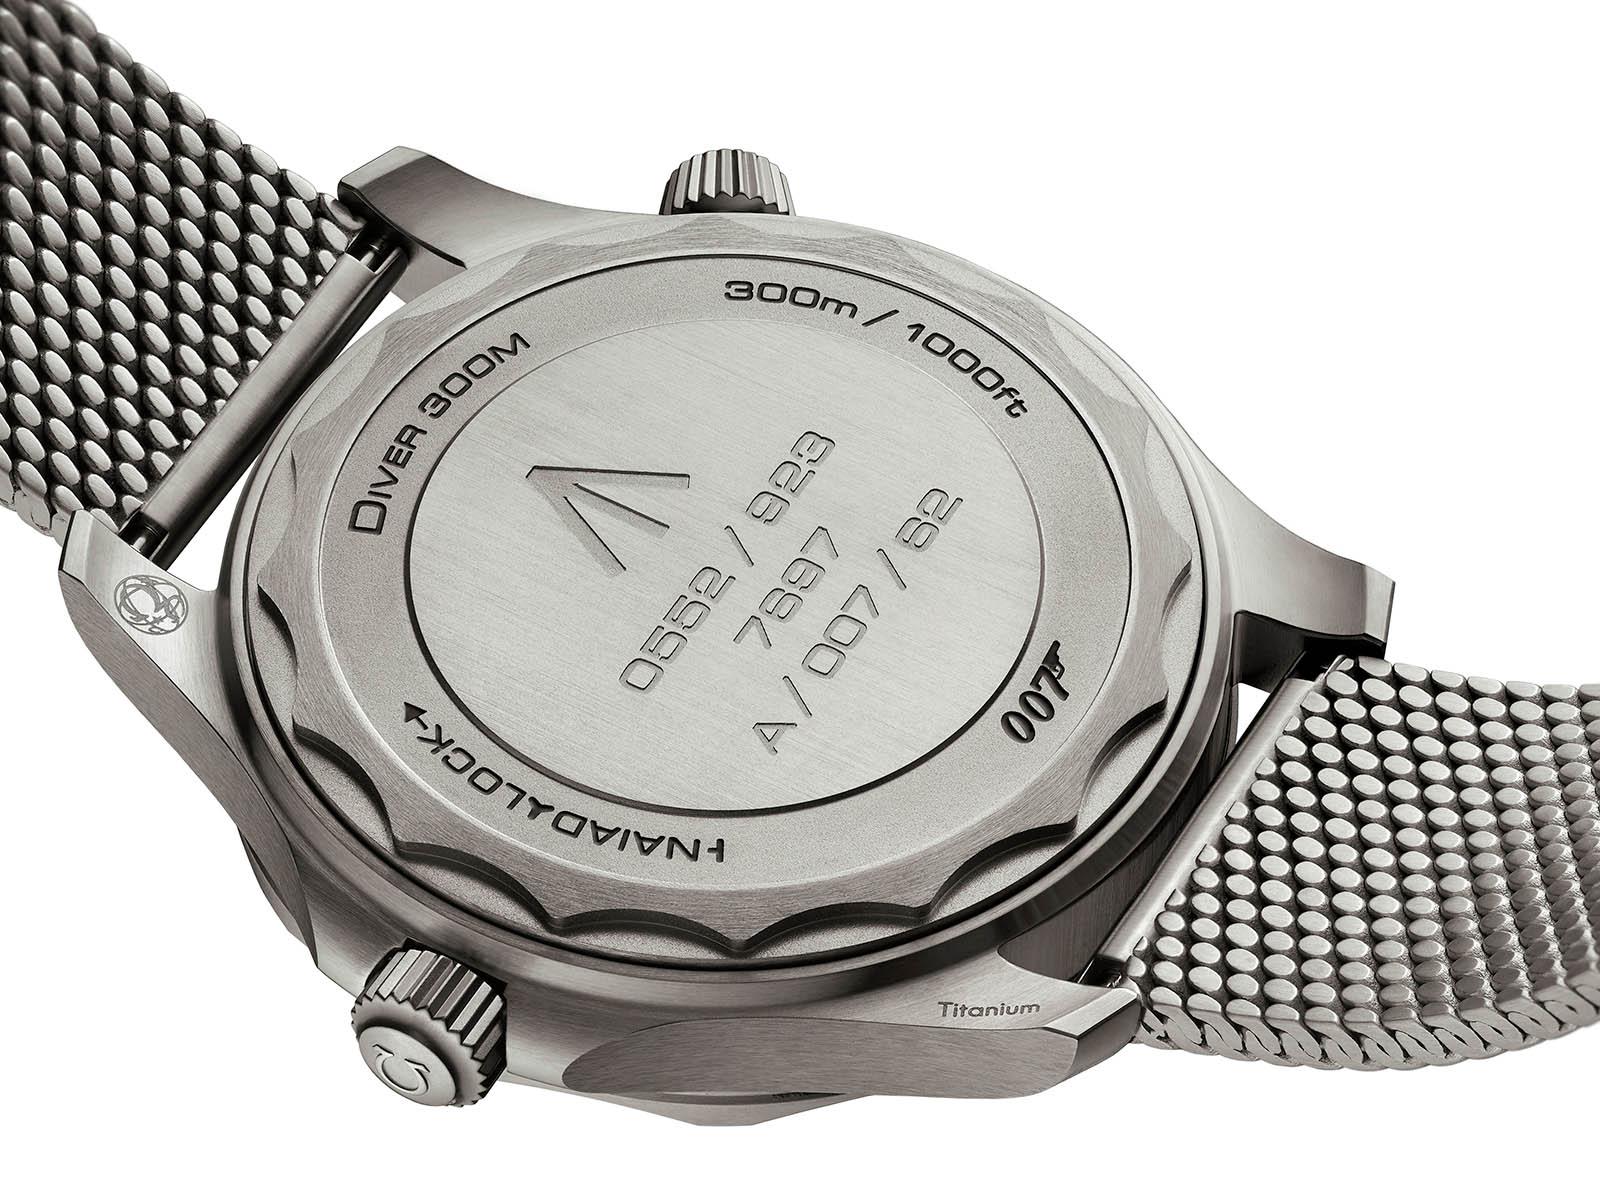 210-90-42-20-01-001-omega-seamaster-diver-300m-007-edition-6.jpg